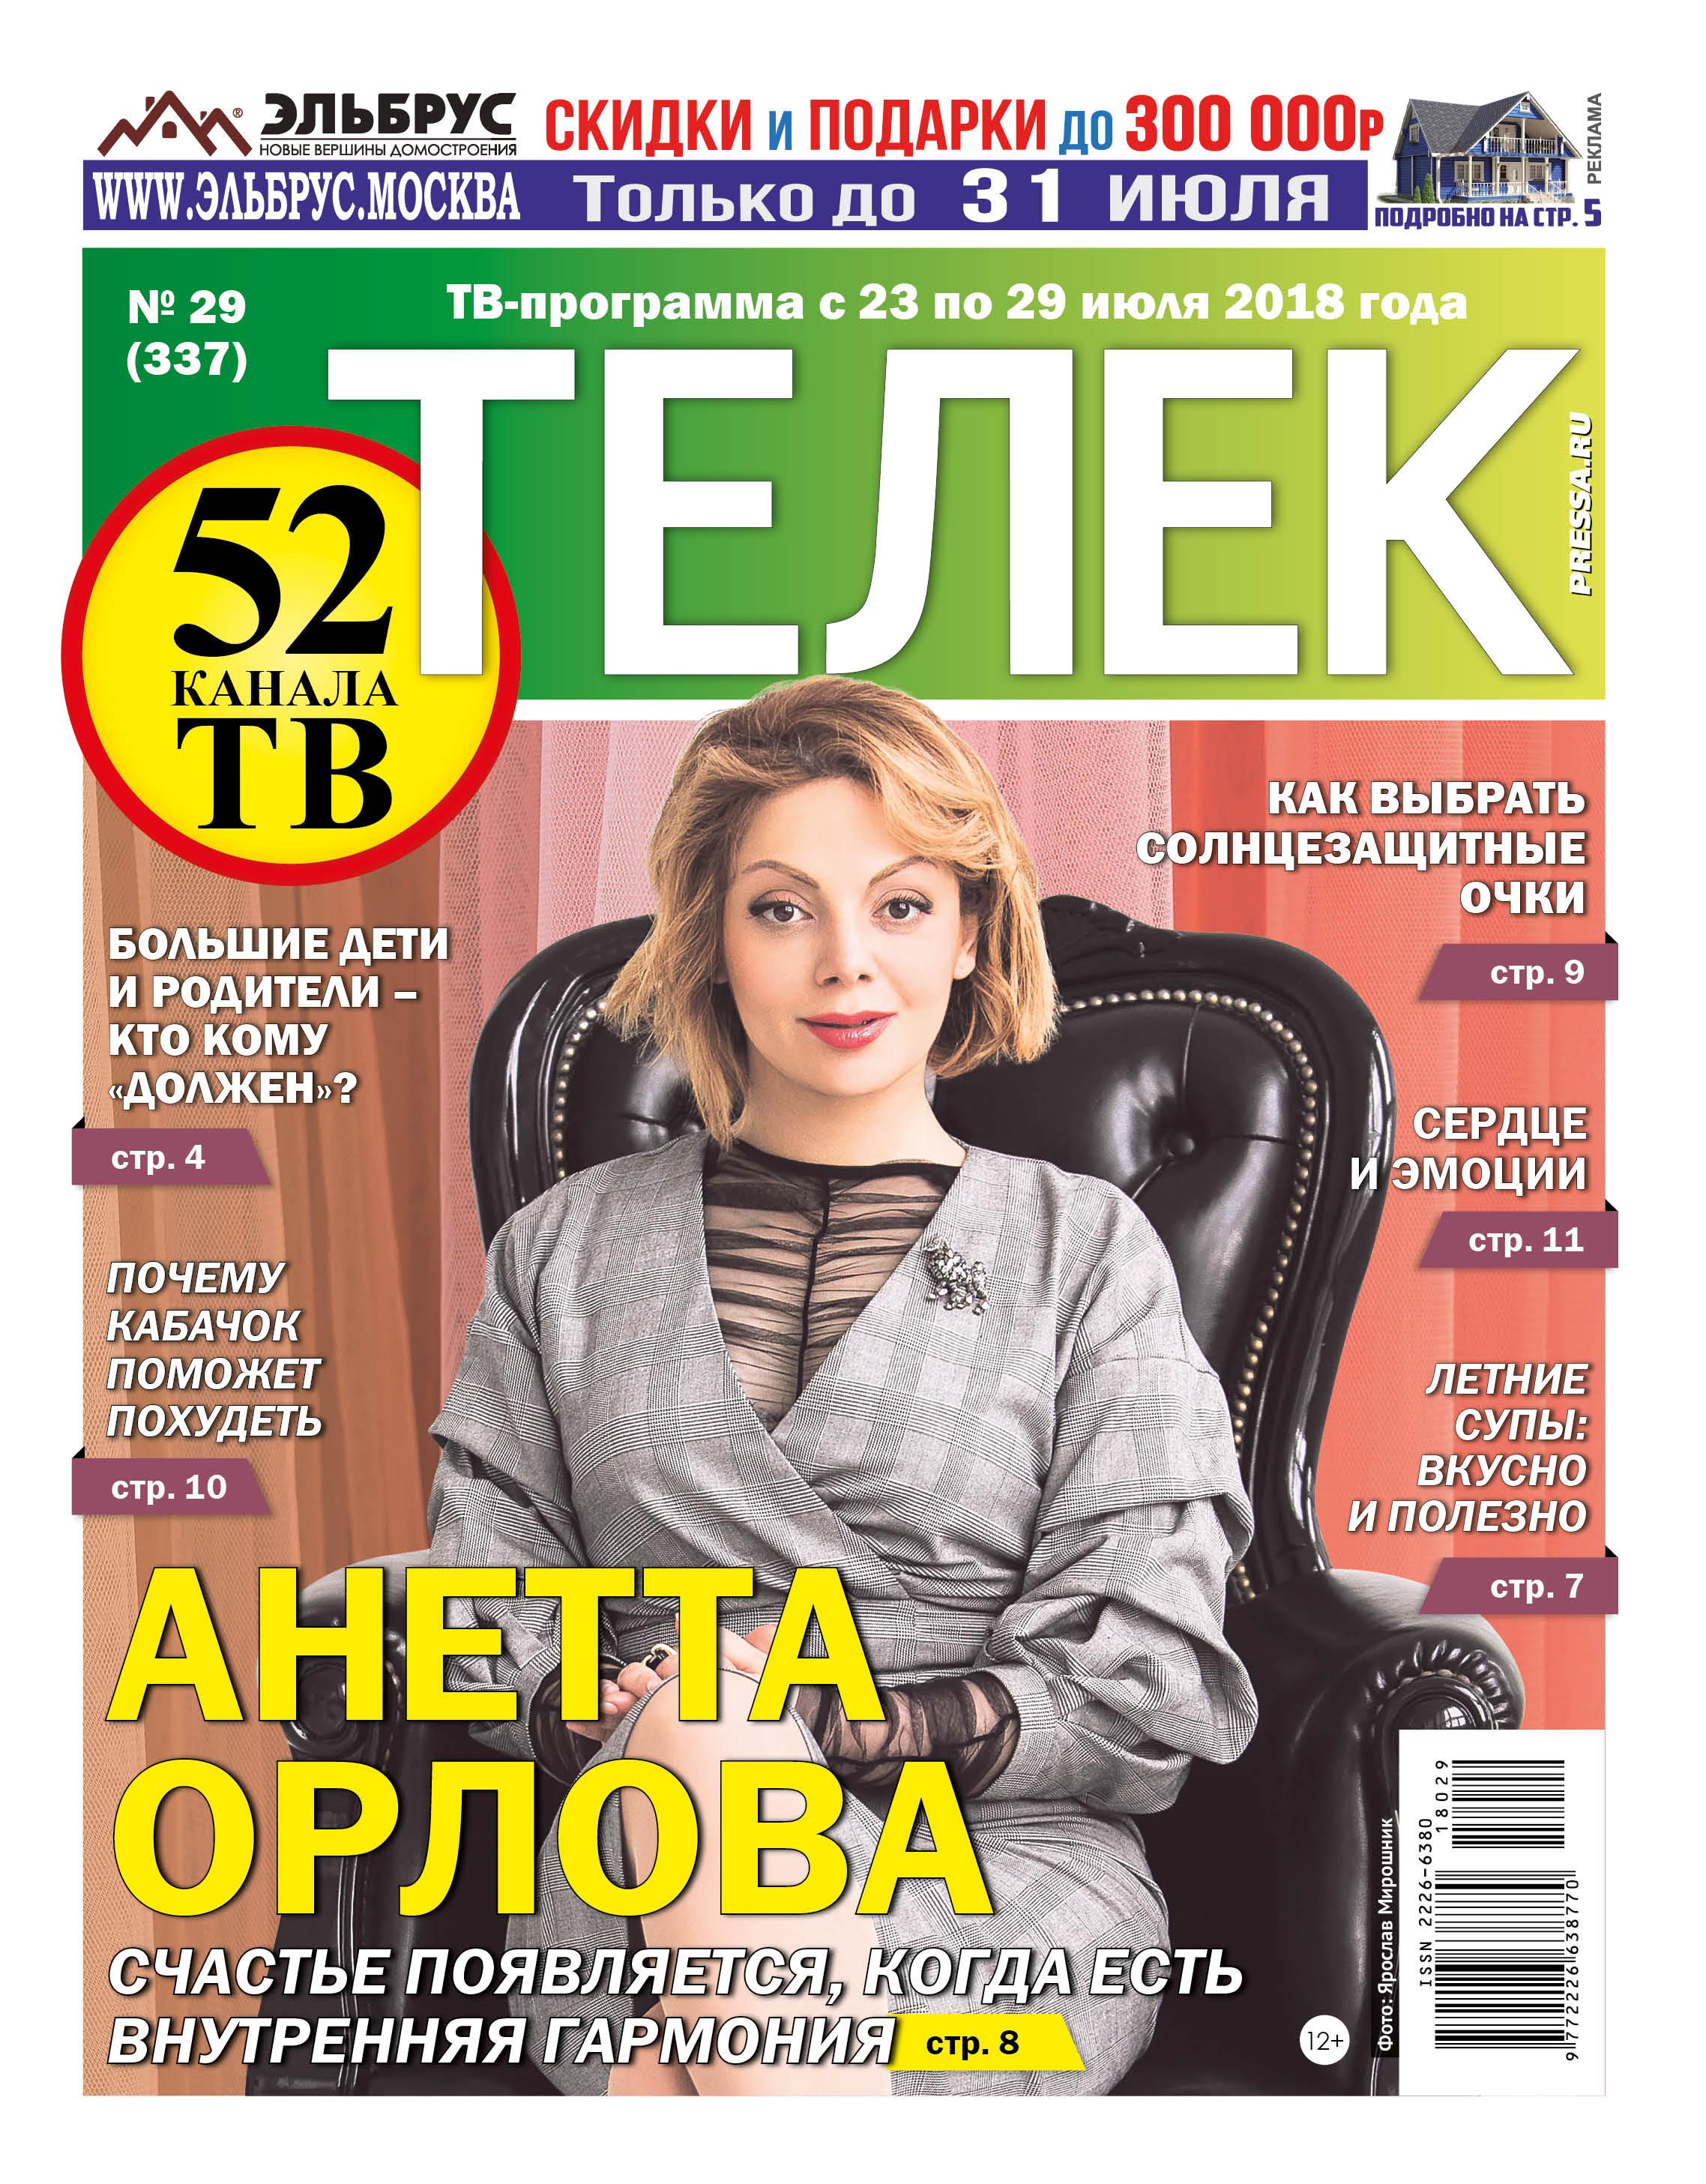 №29 (337) Анетта Орлова